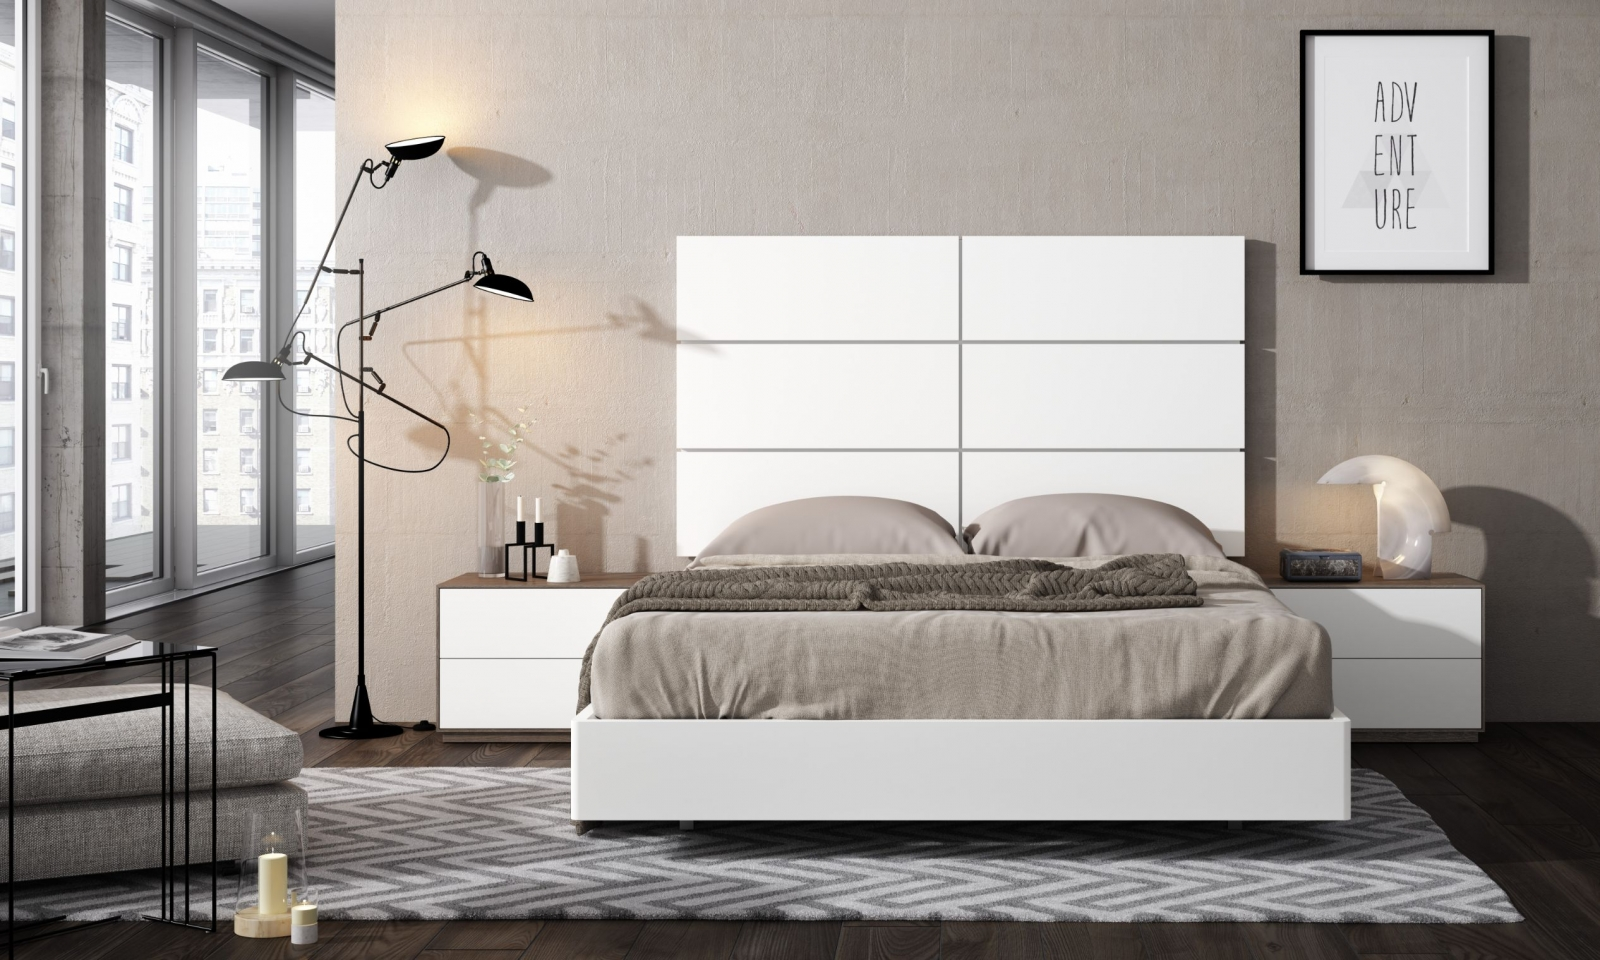 Conjunto de Dormitorio Classic 1.0 04 - Conjunto de Dormitorio Classic 1.0 04